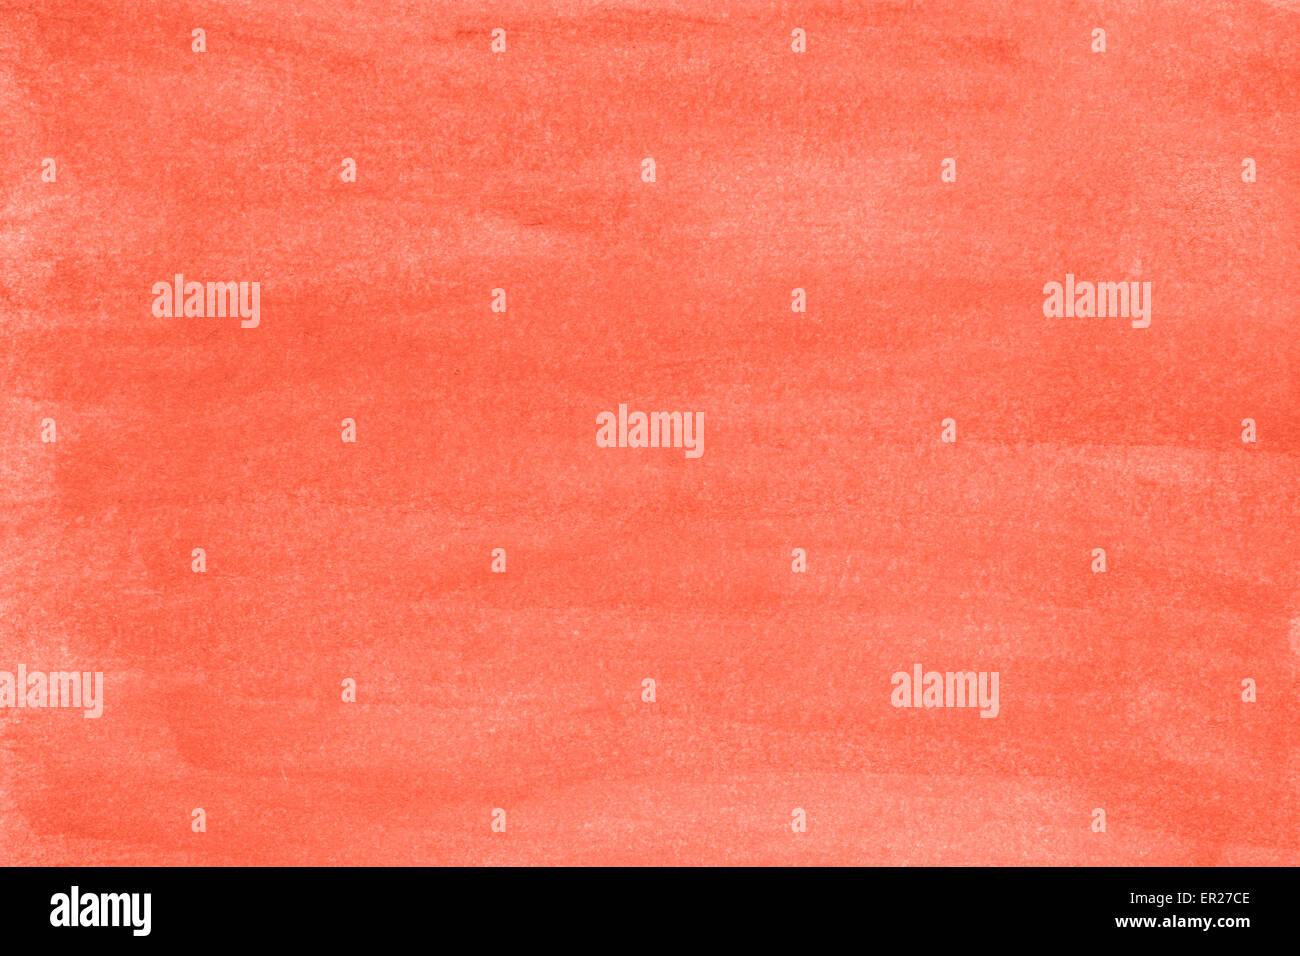 Acuarela fondo rojo Imagen De Stock